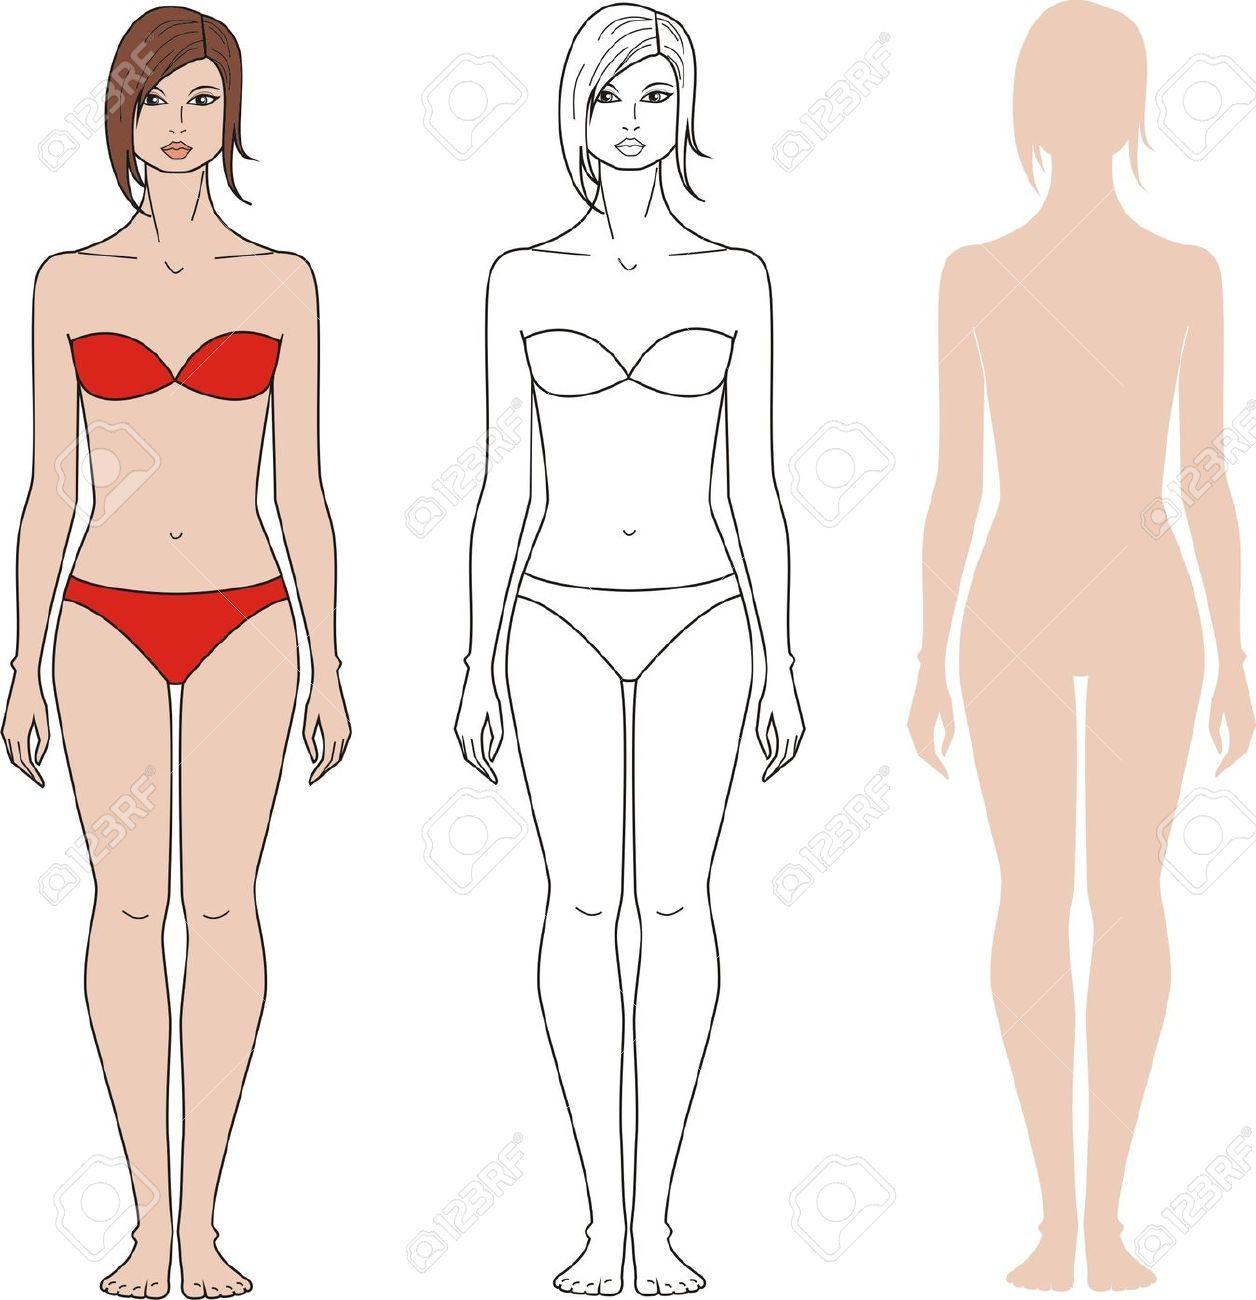 Body clipart woman. Details of women unisex